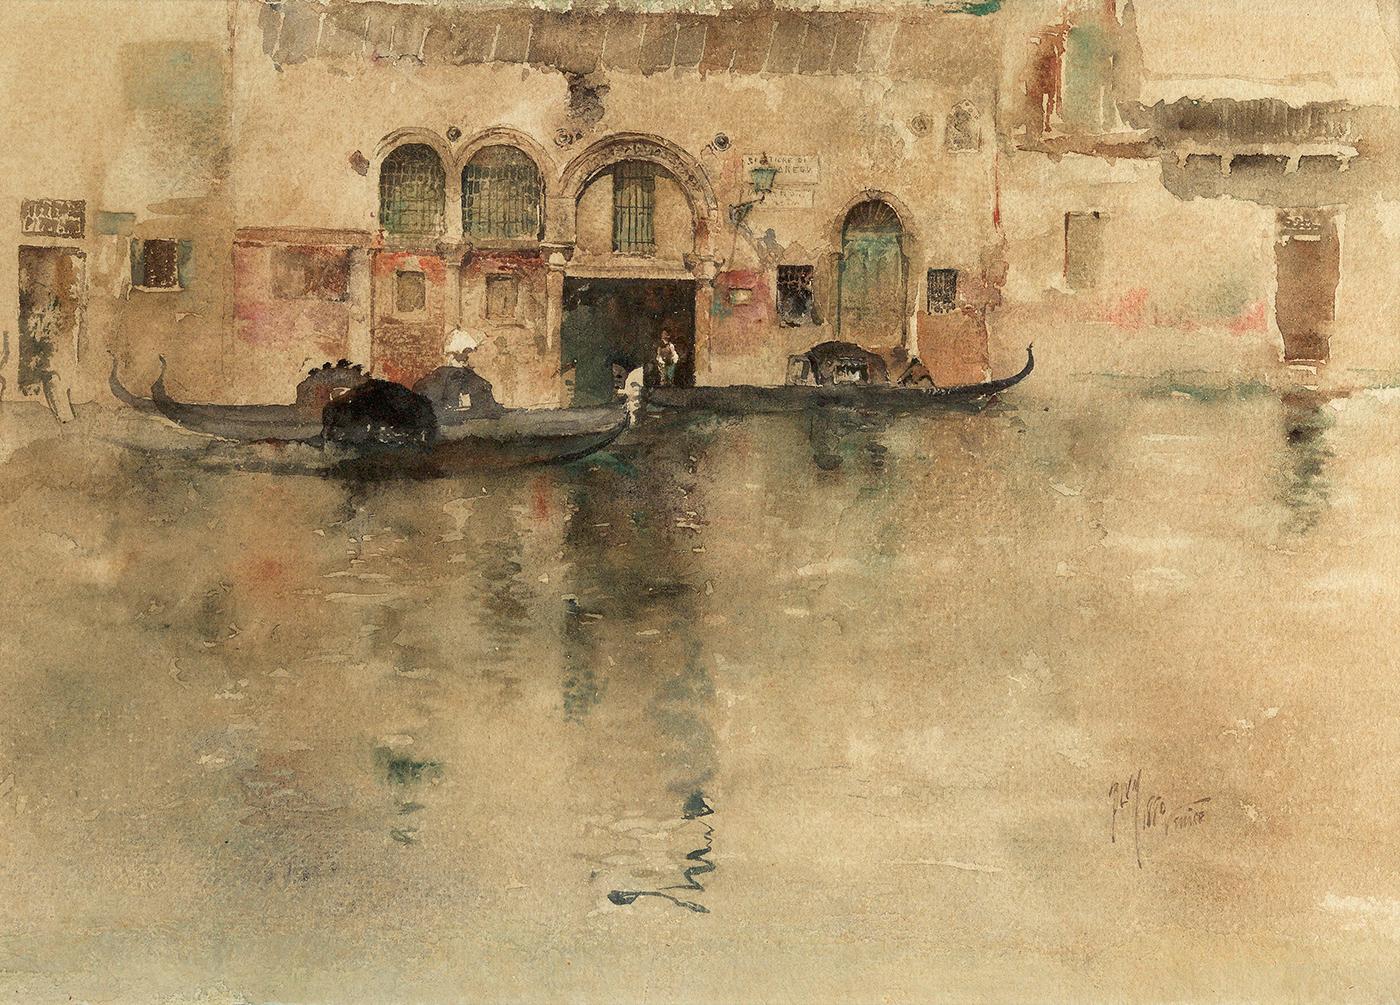 alt The Traghetto, Venice, 1880